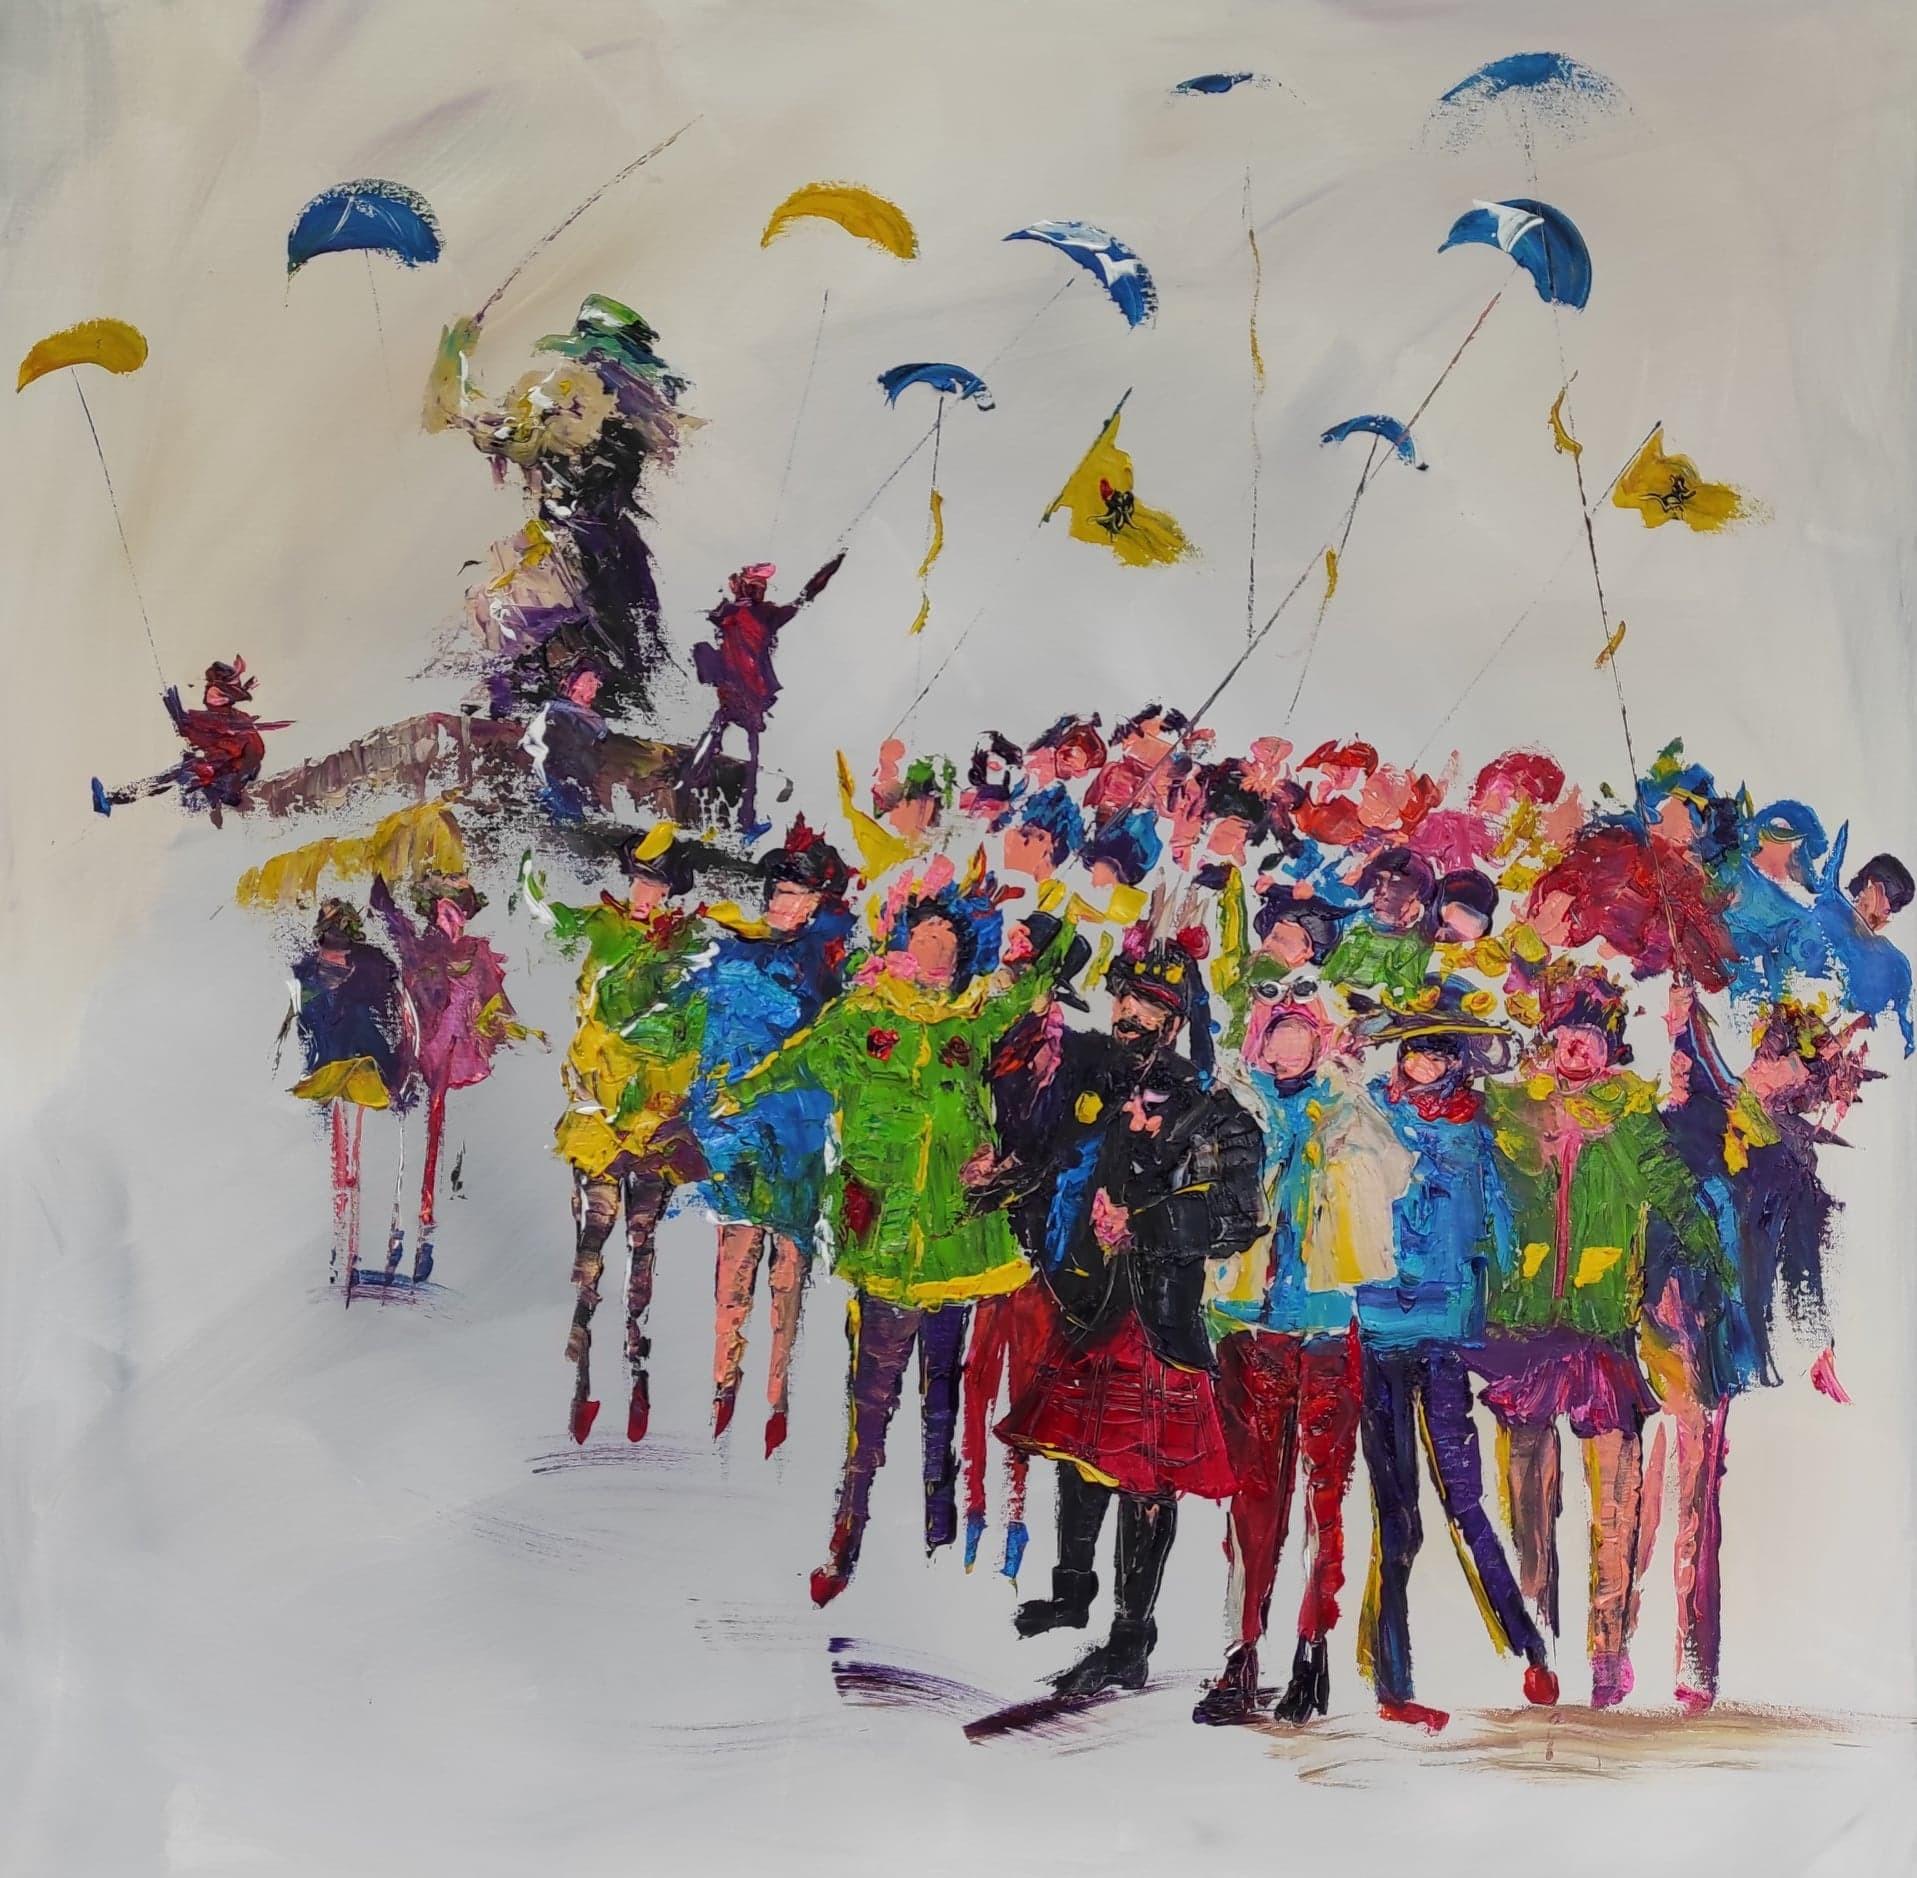 Carnaval de dunkerque 1m x 1m